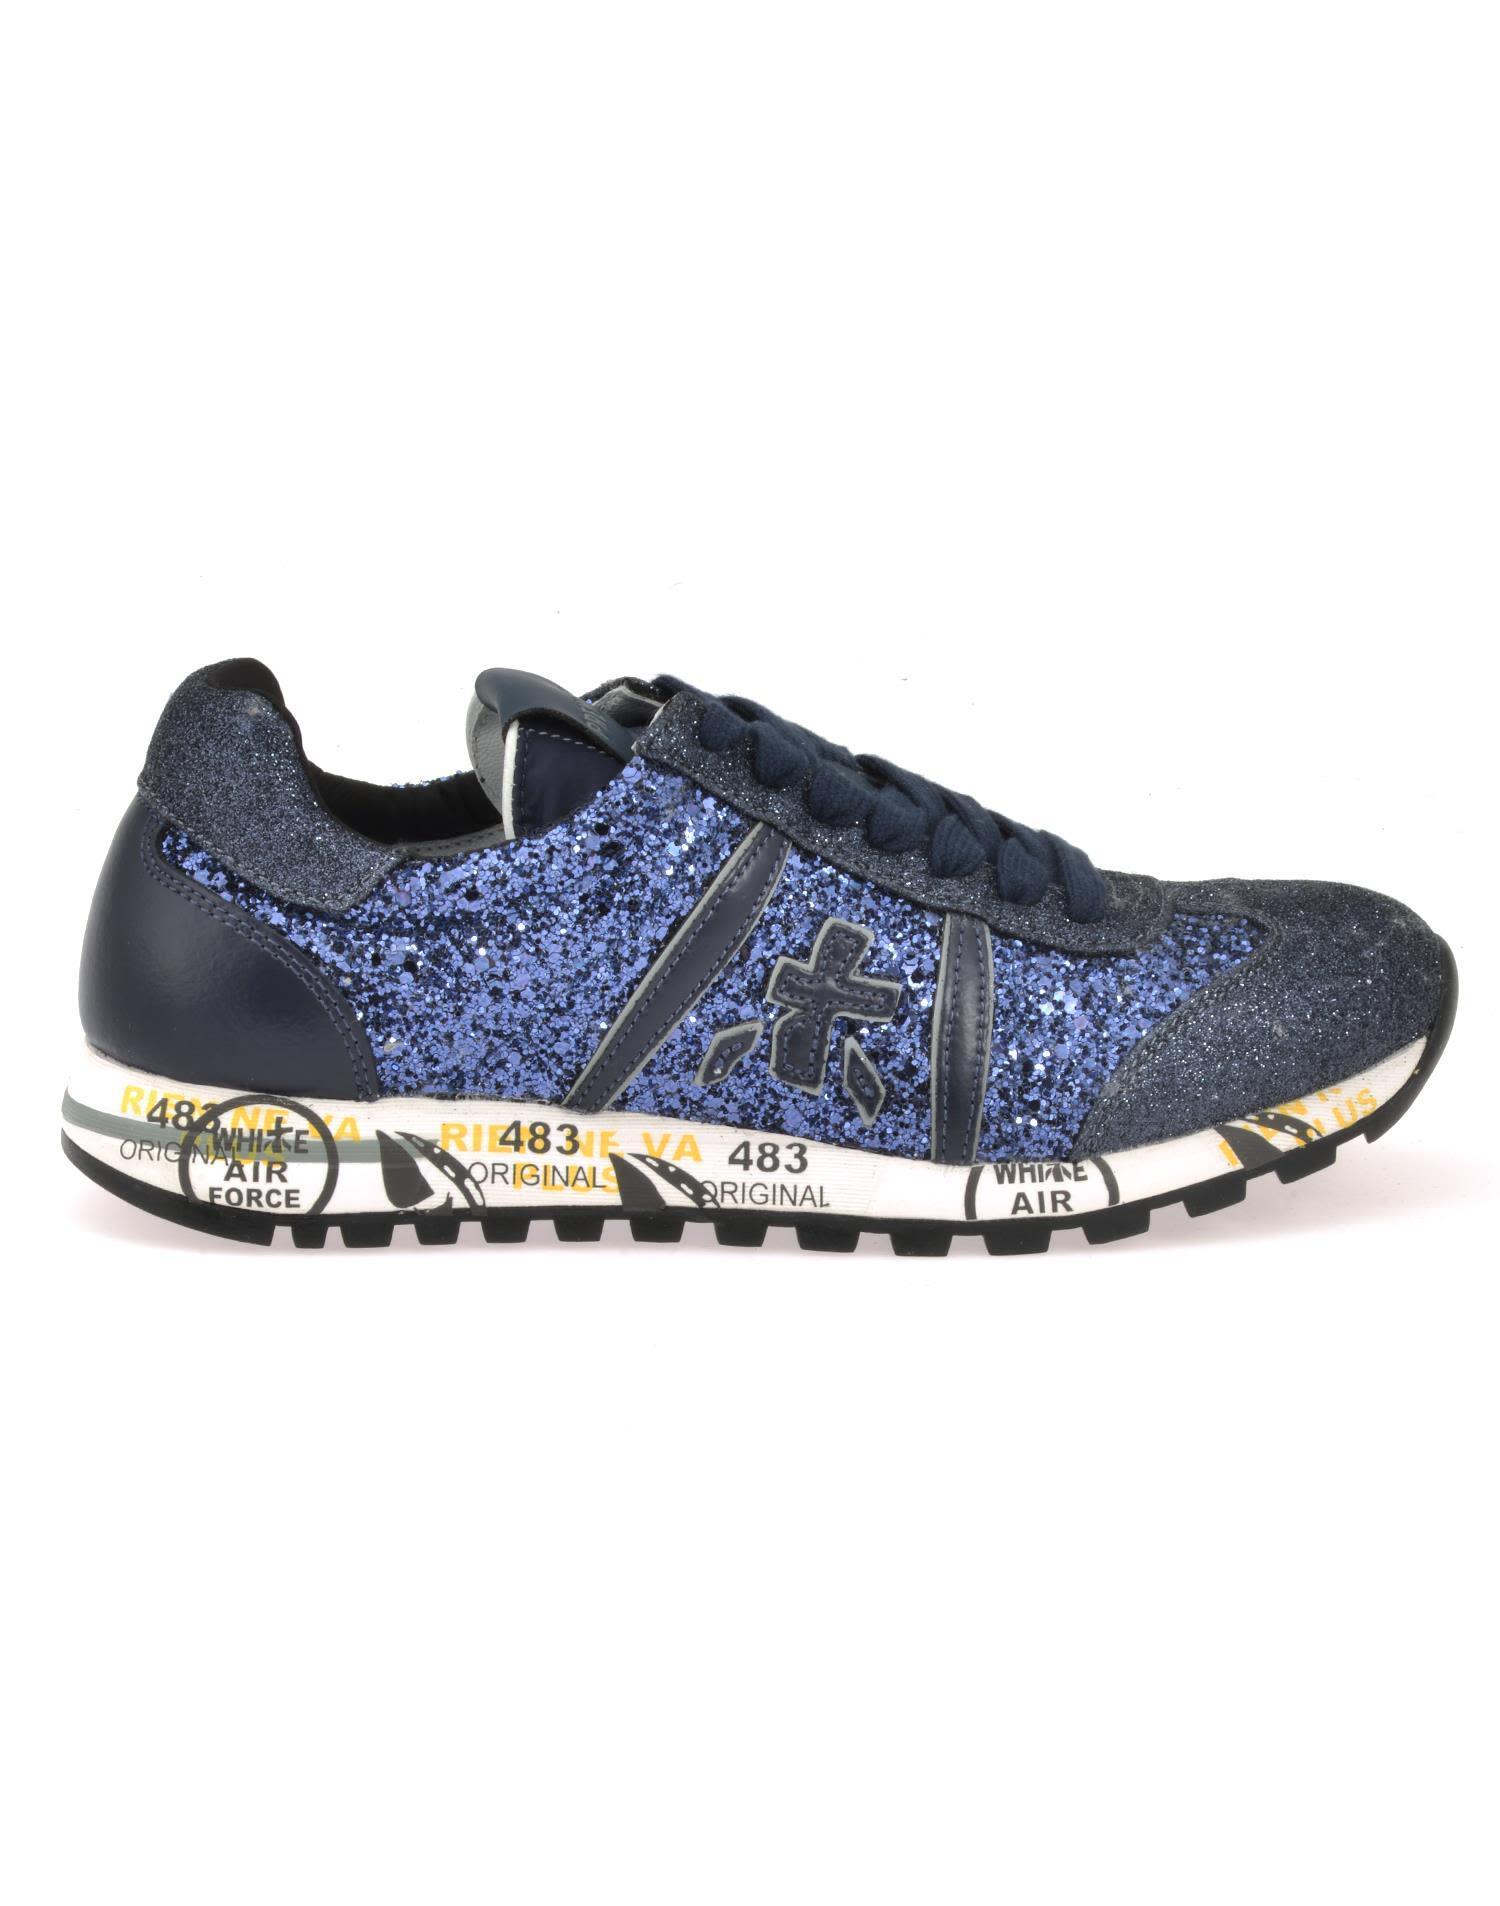 White Premiata Lucy D Sneaker In Blue